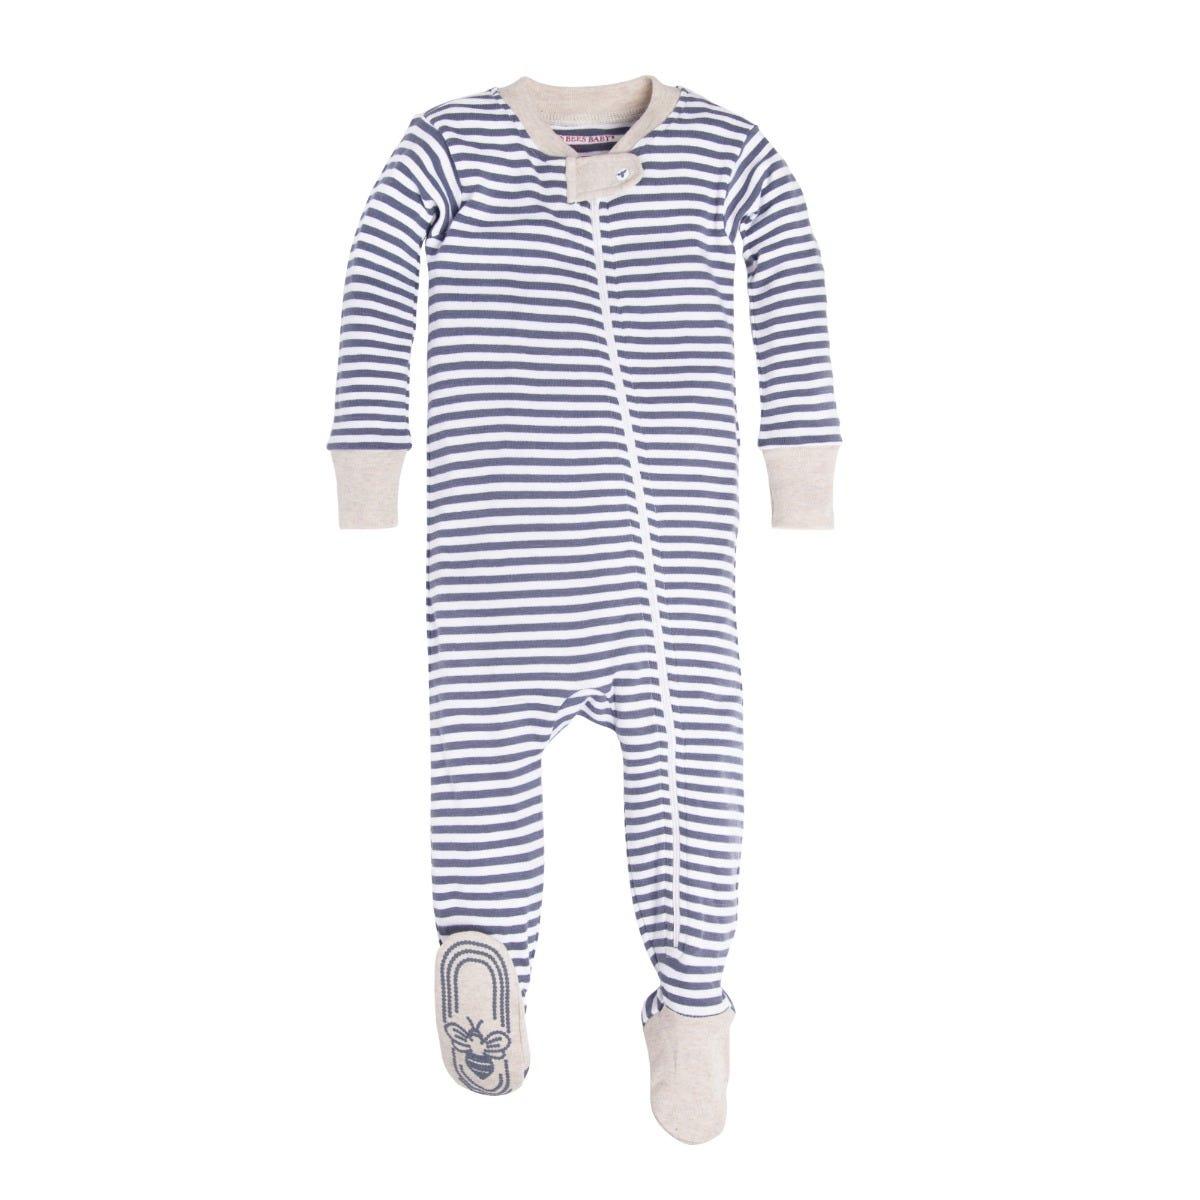 Burts Bees Baby Baby Unisex Pajamas Organic Cotton Zip-Front Non-Slip Footed Sleeper Pjs